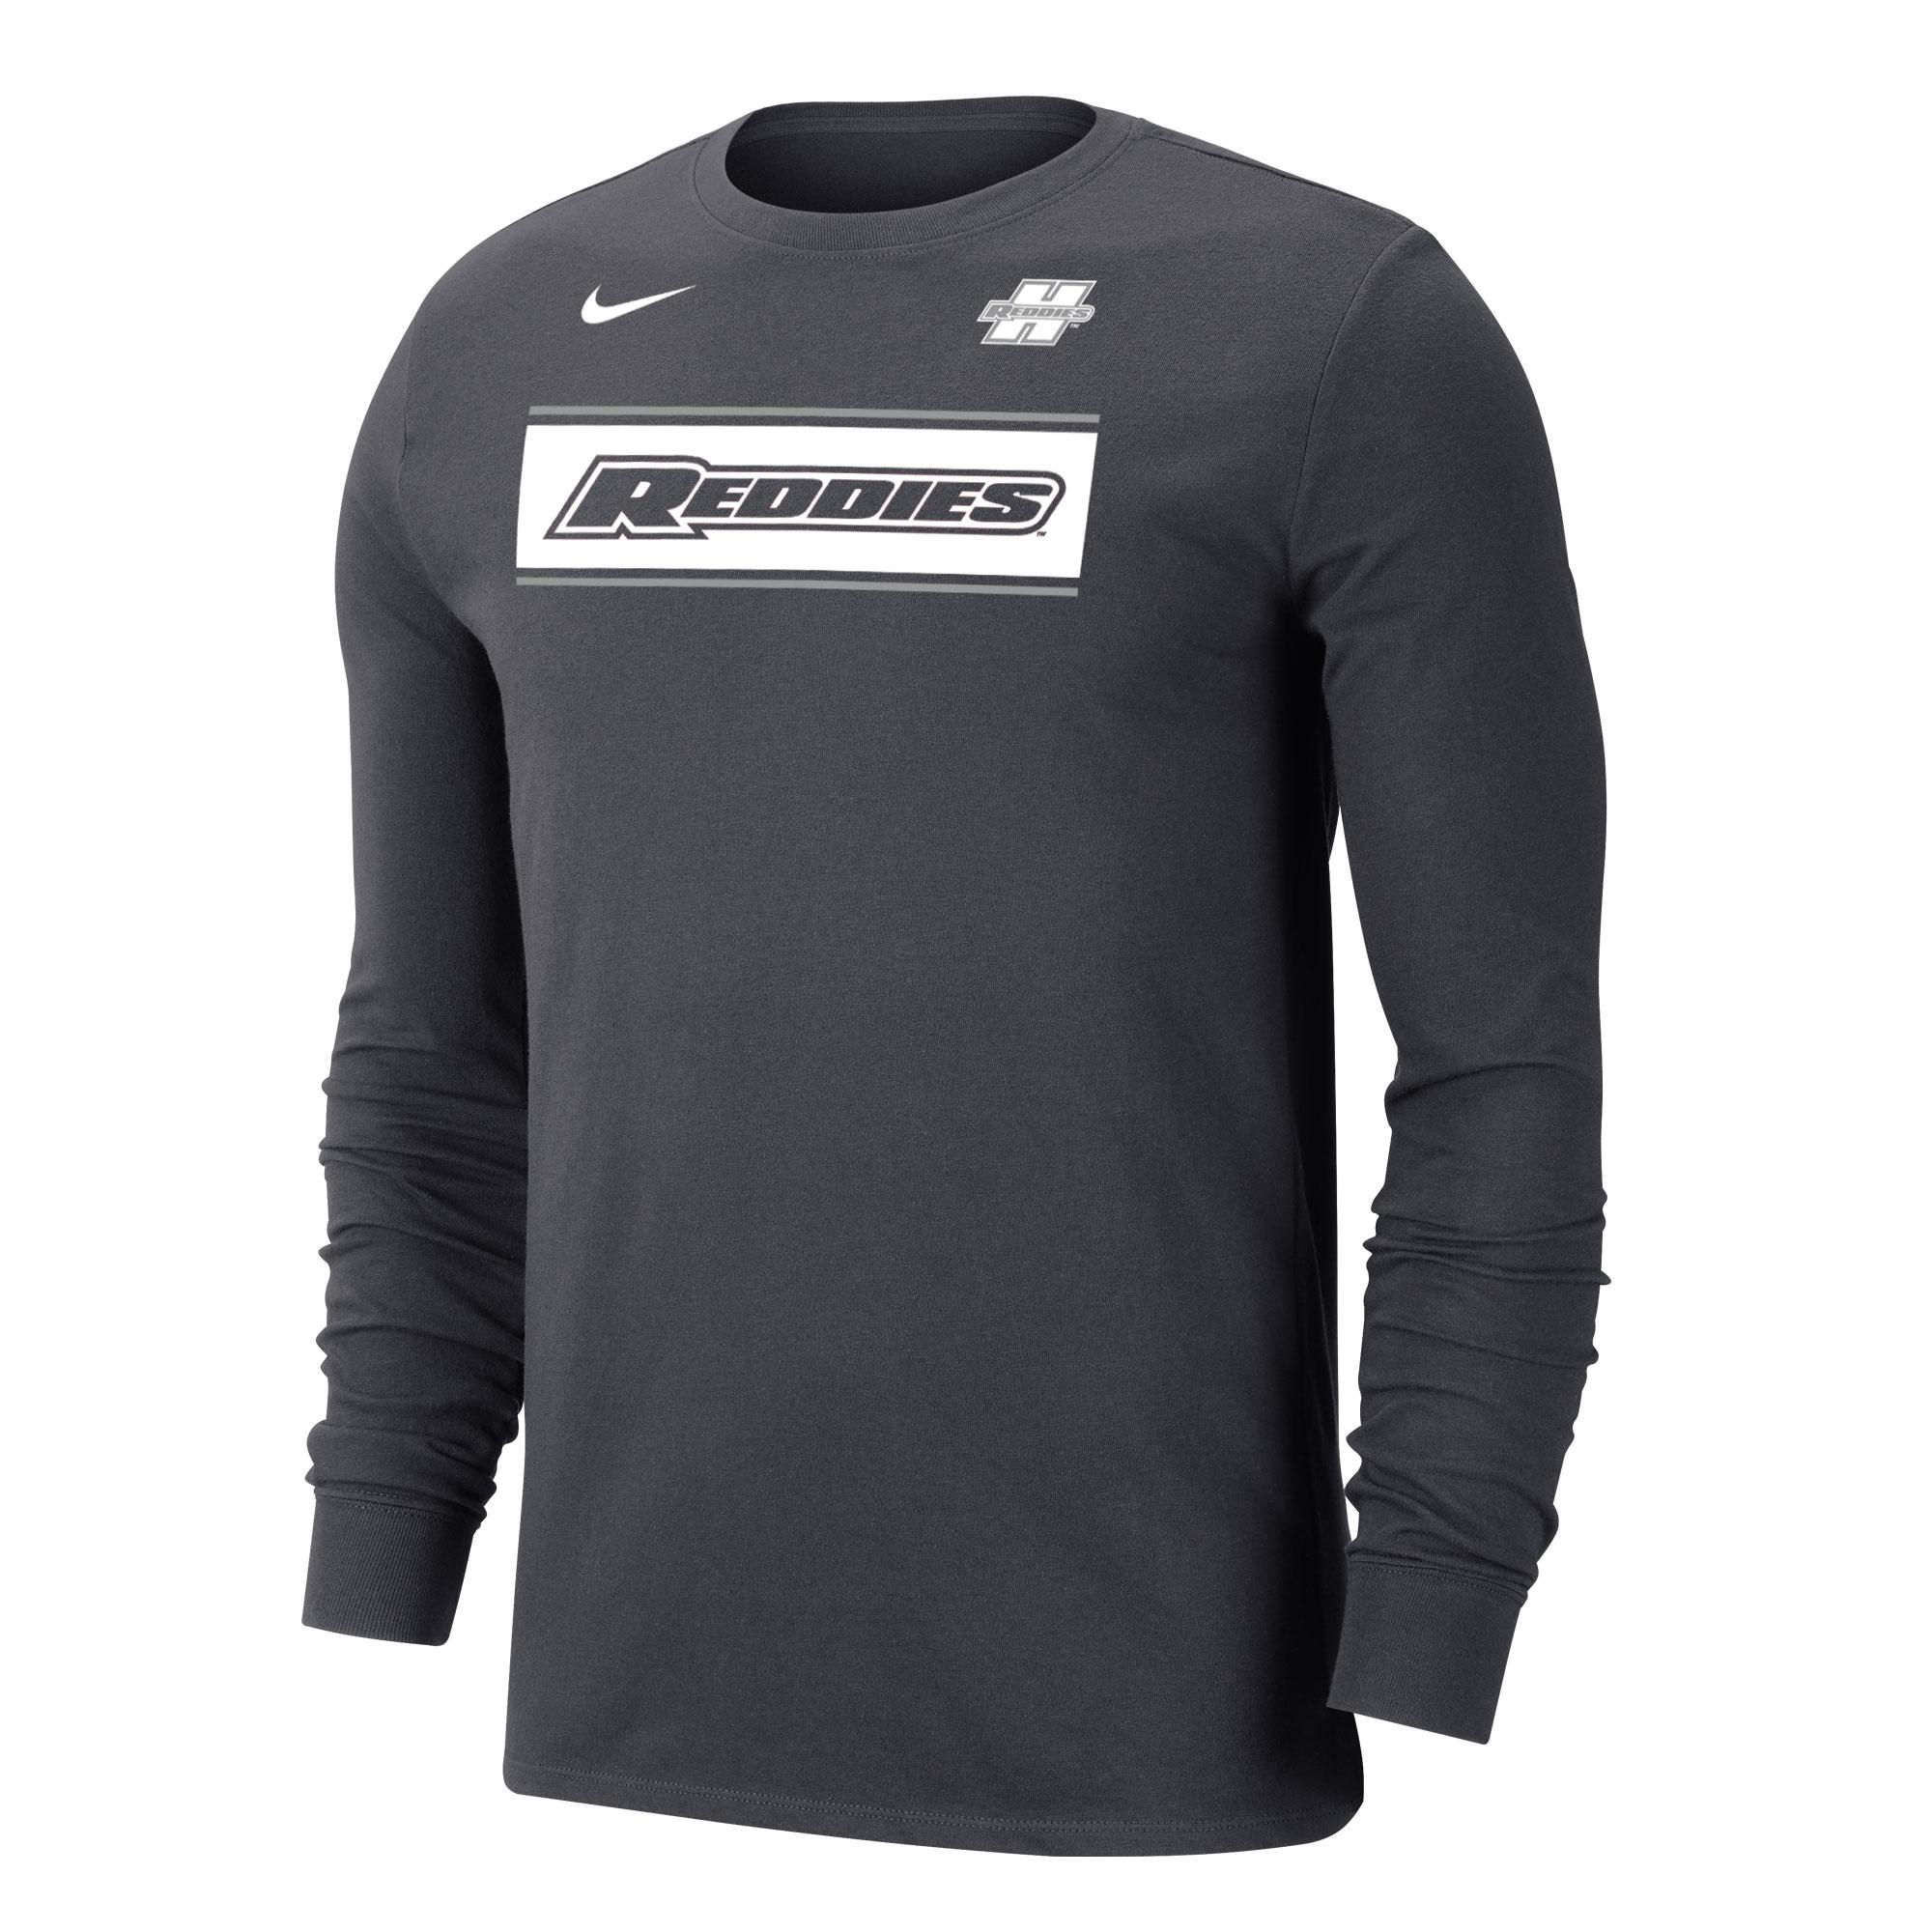 image of: Henderson Reddies Dri-FIT Cotton Long Sleeve T-Shirt